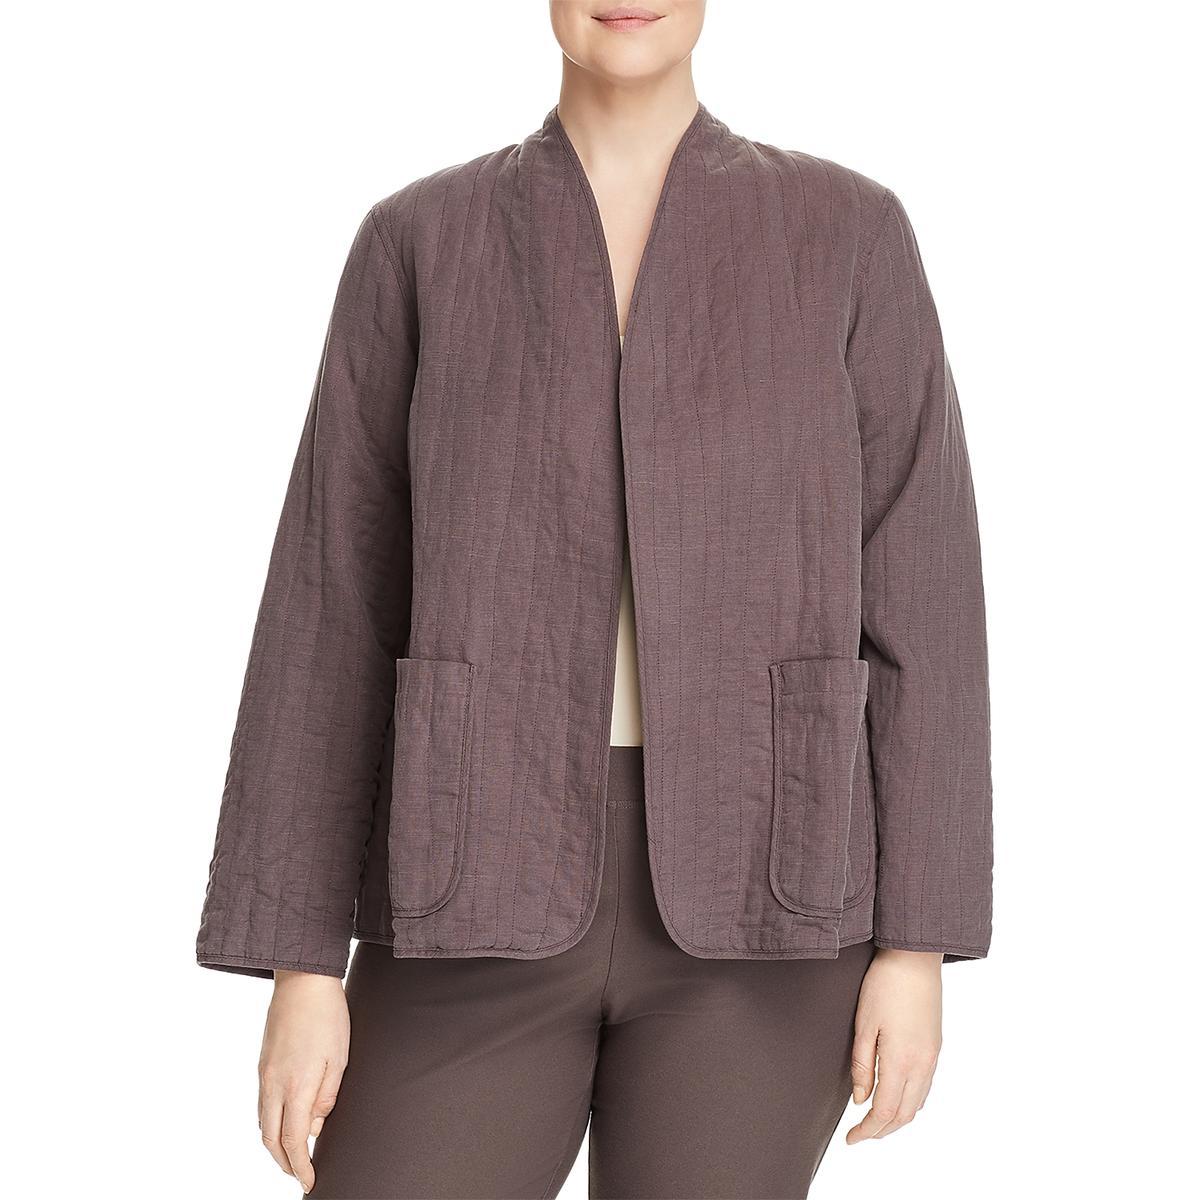 a69bc447078 Eileen Fisher Womens High Collar Open Front Jacket Blazer Plus BHFO ...